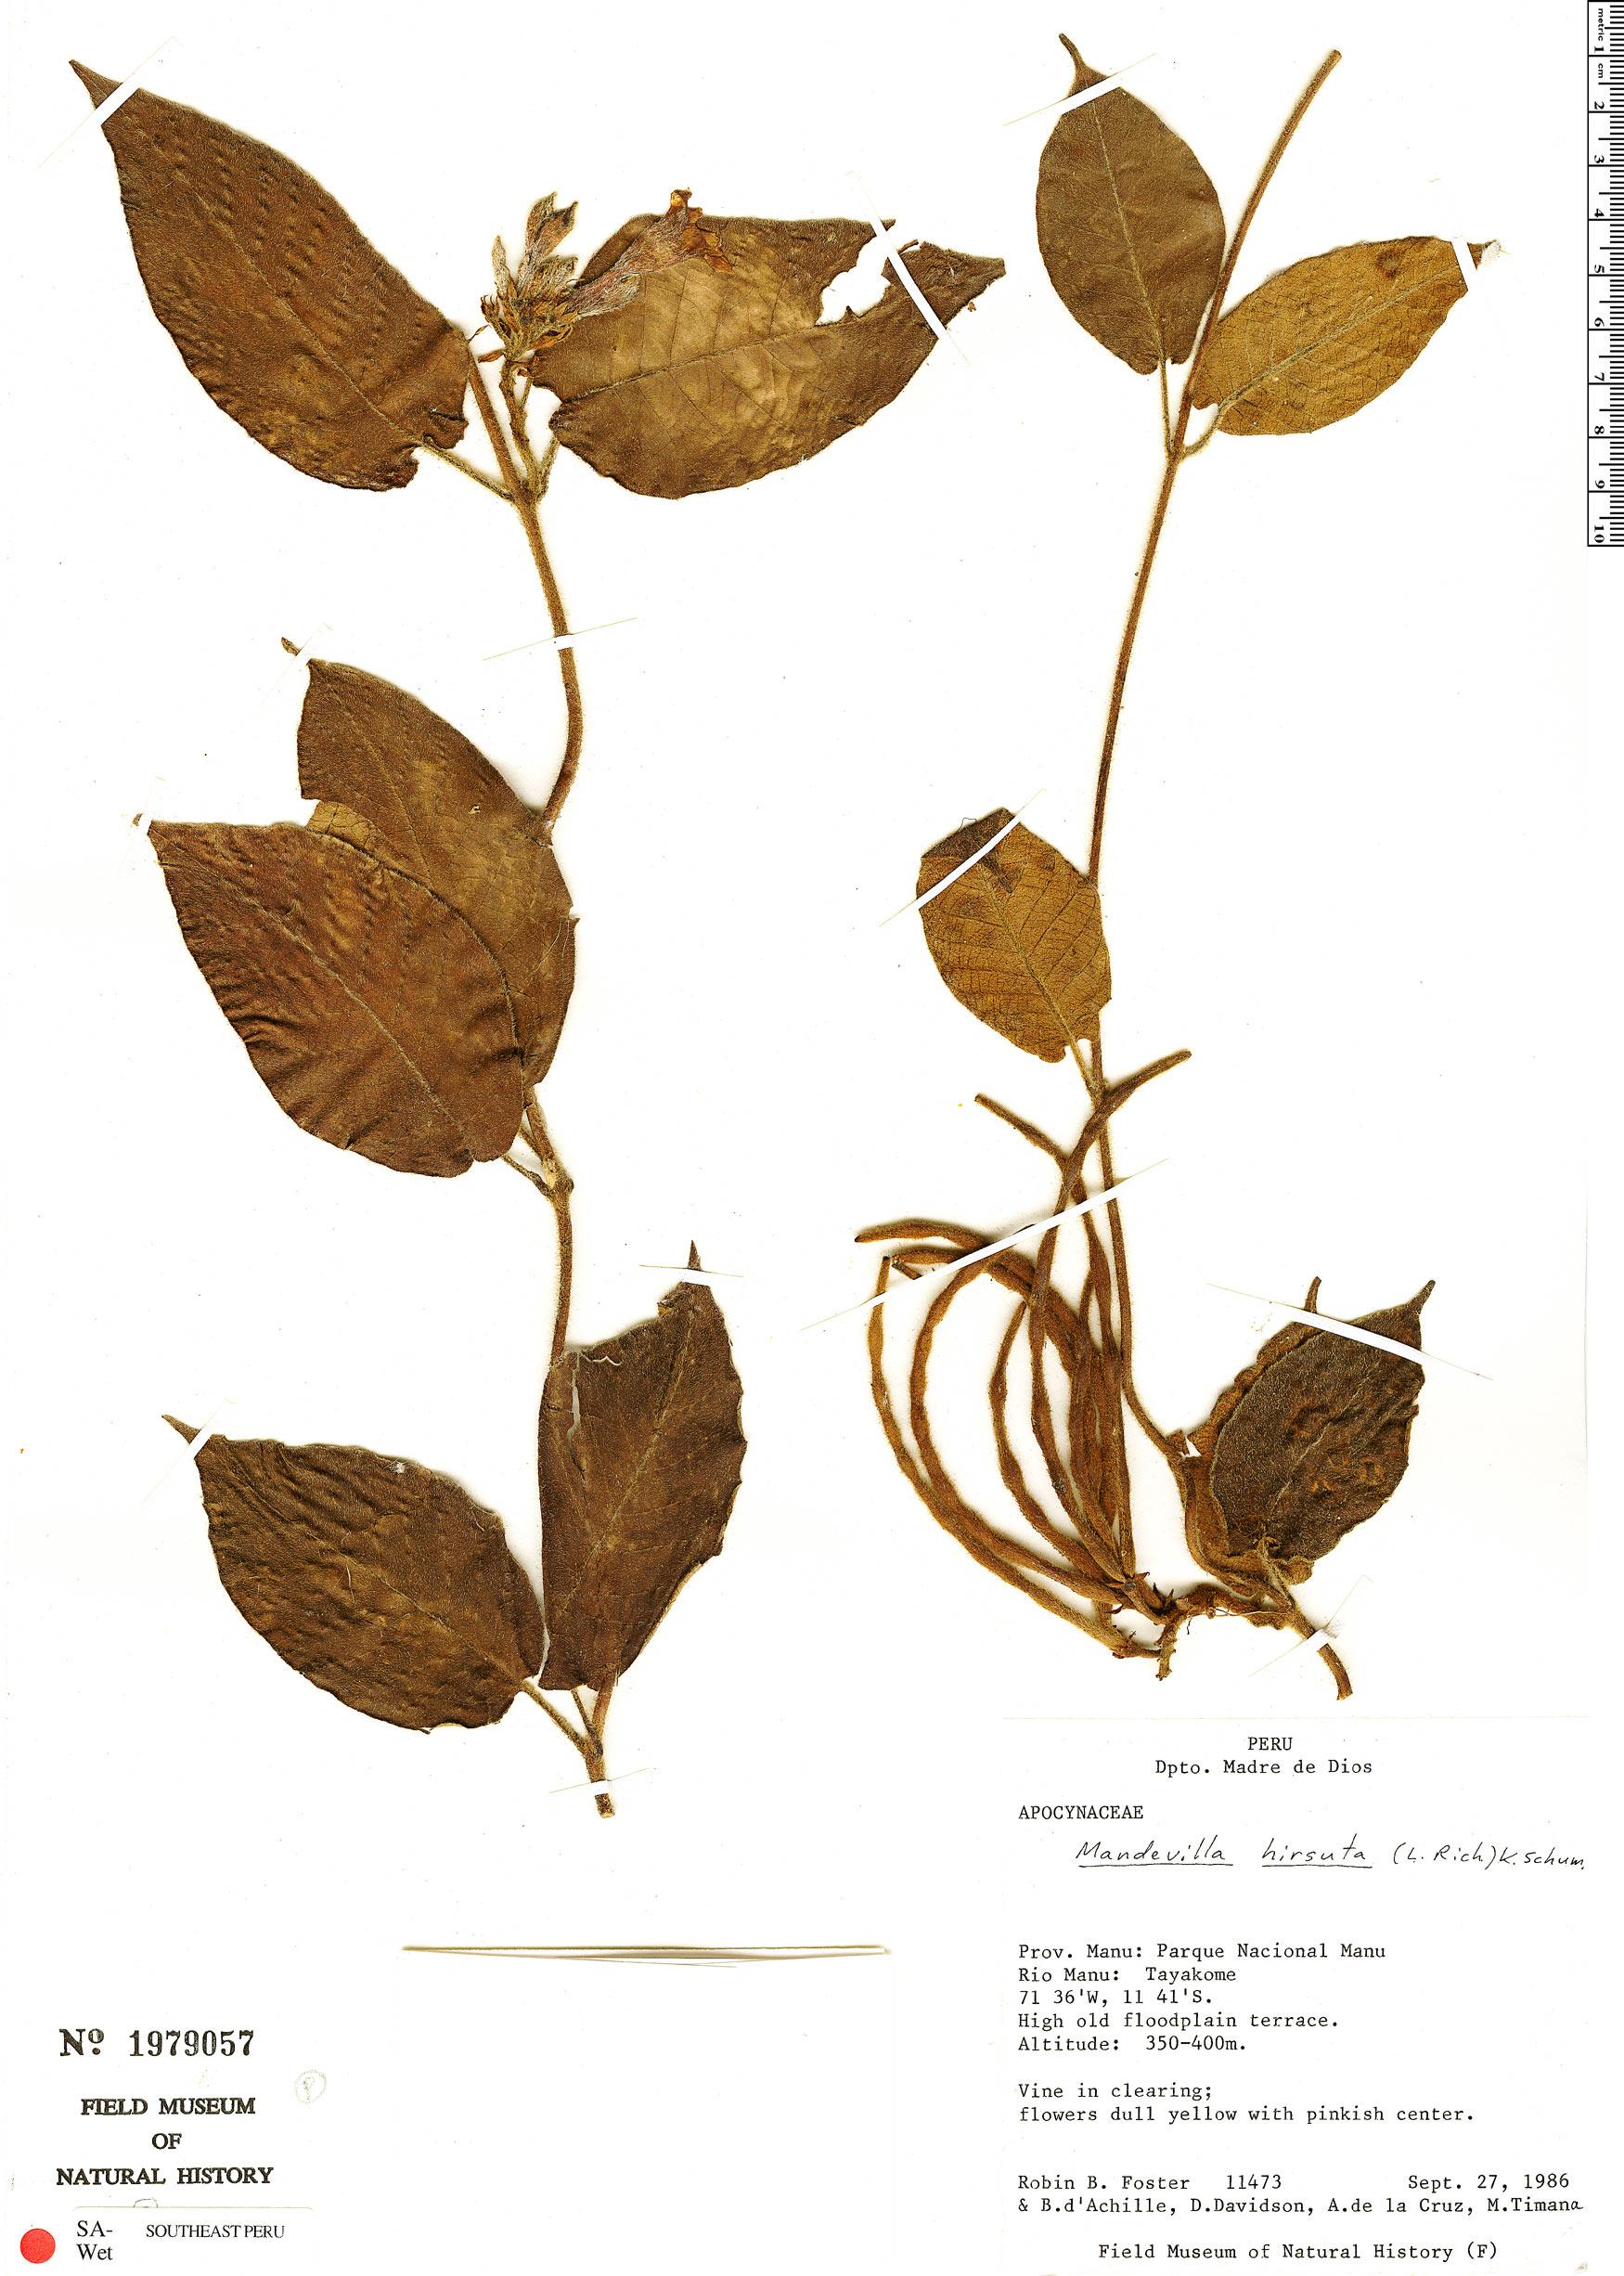 Espécime: Mandevilla hirsuta